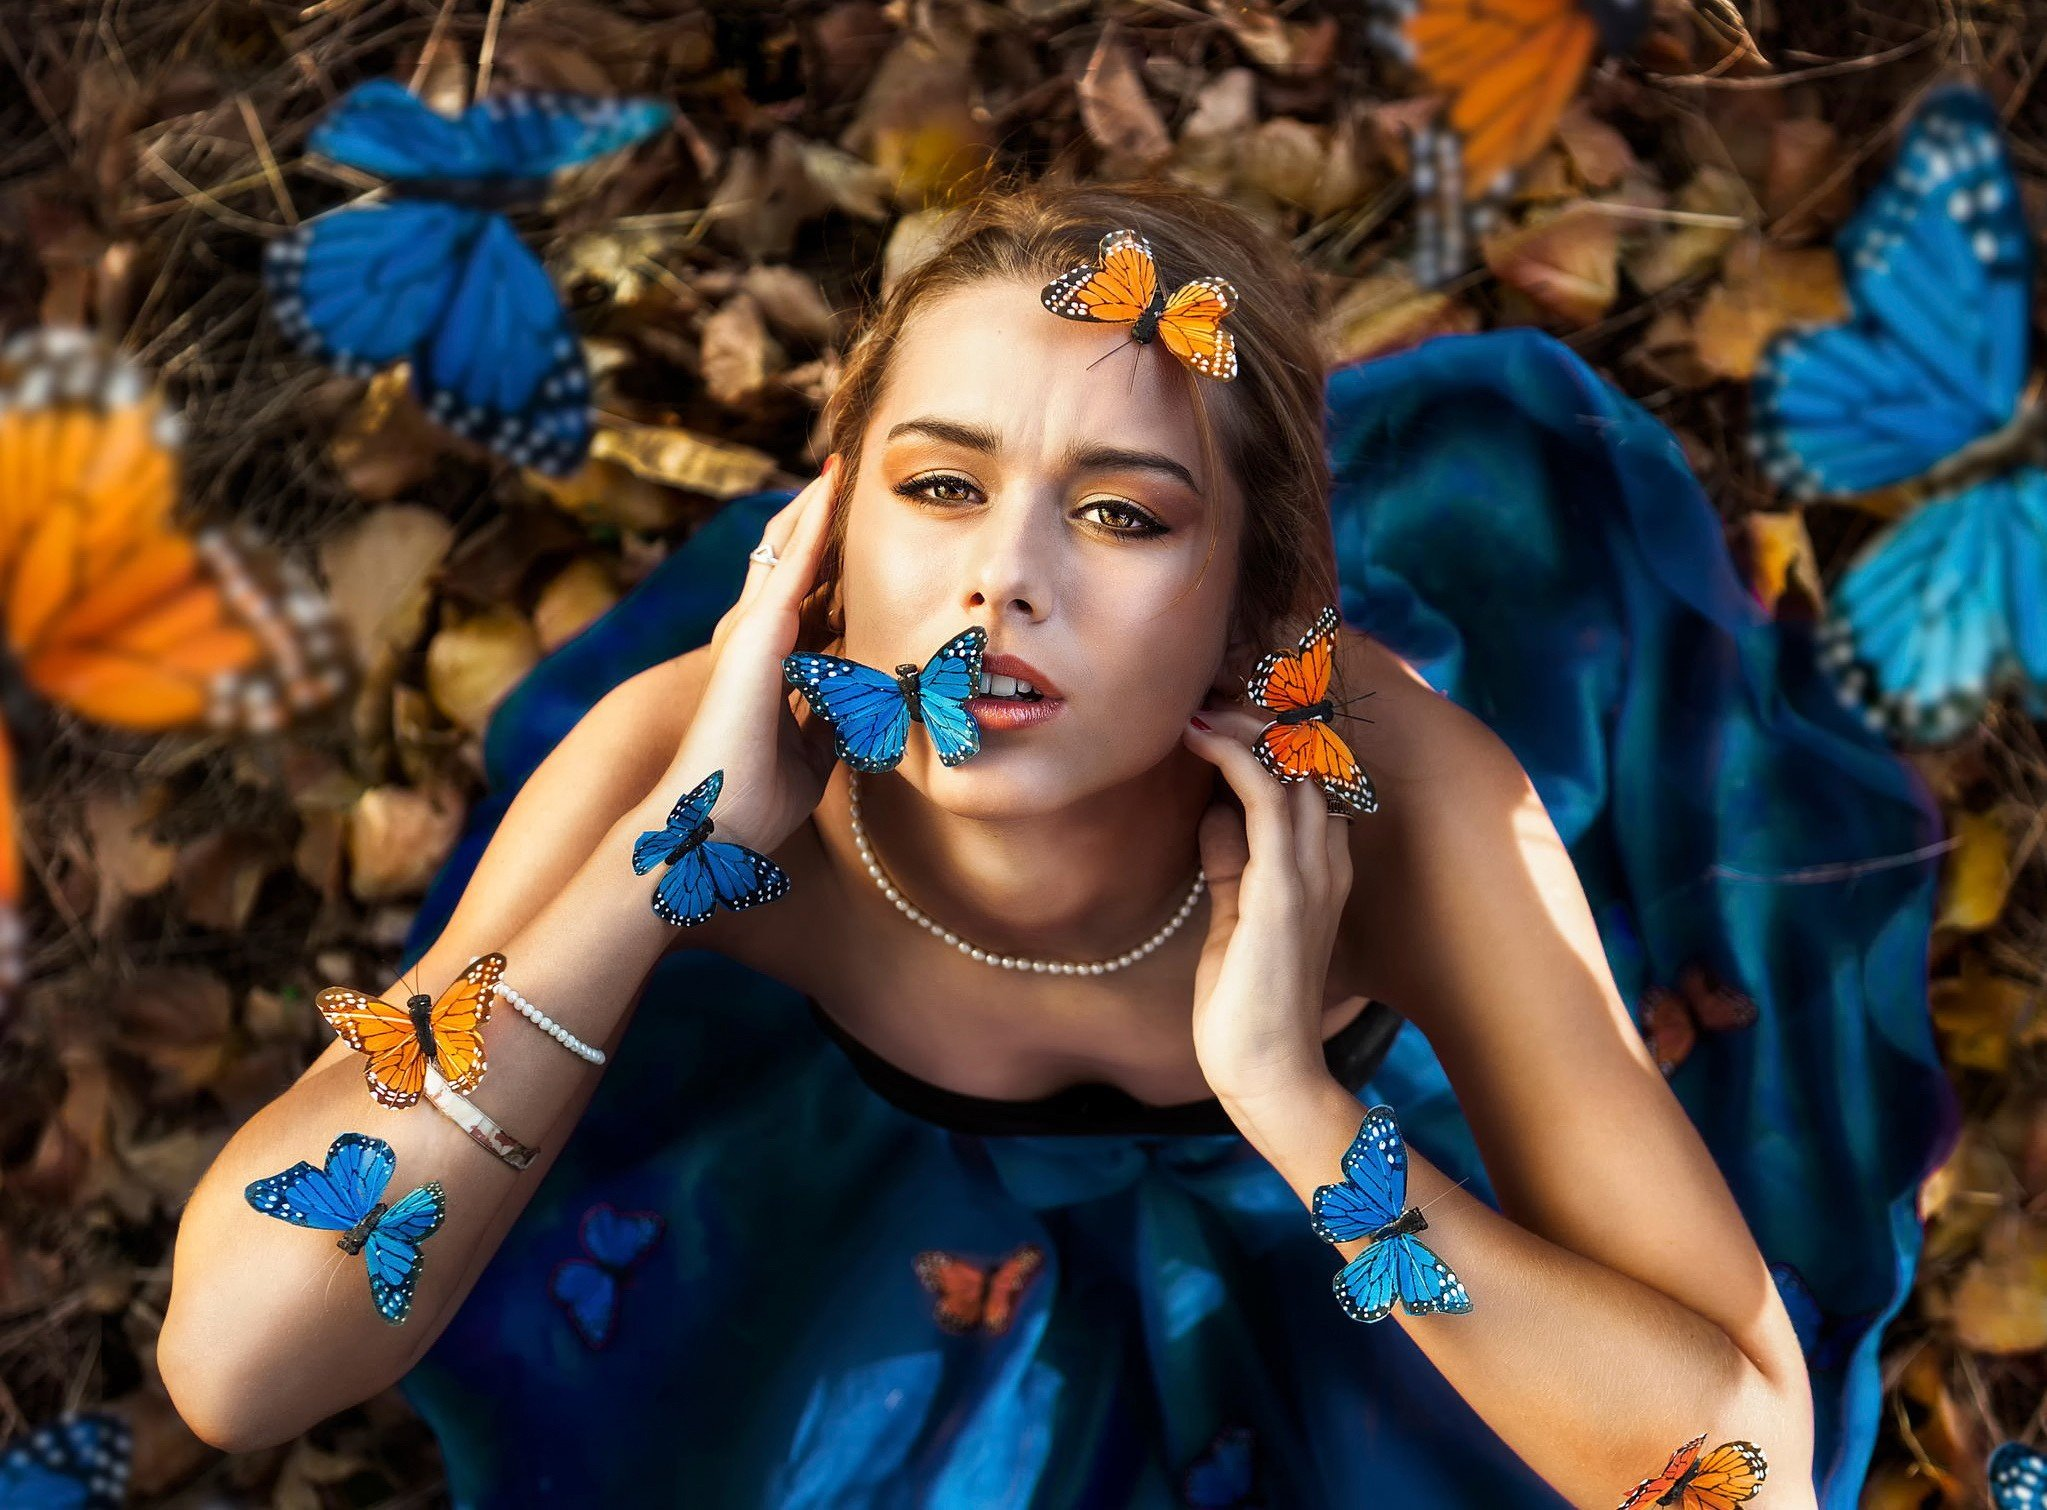 women, Model, Brunette, Long hair, Women outdoors, Nature, Looking at viewer, Blue dress, Open mouth, Butterfly, Necklace, Pearls Wallpaper